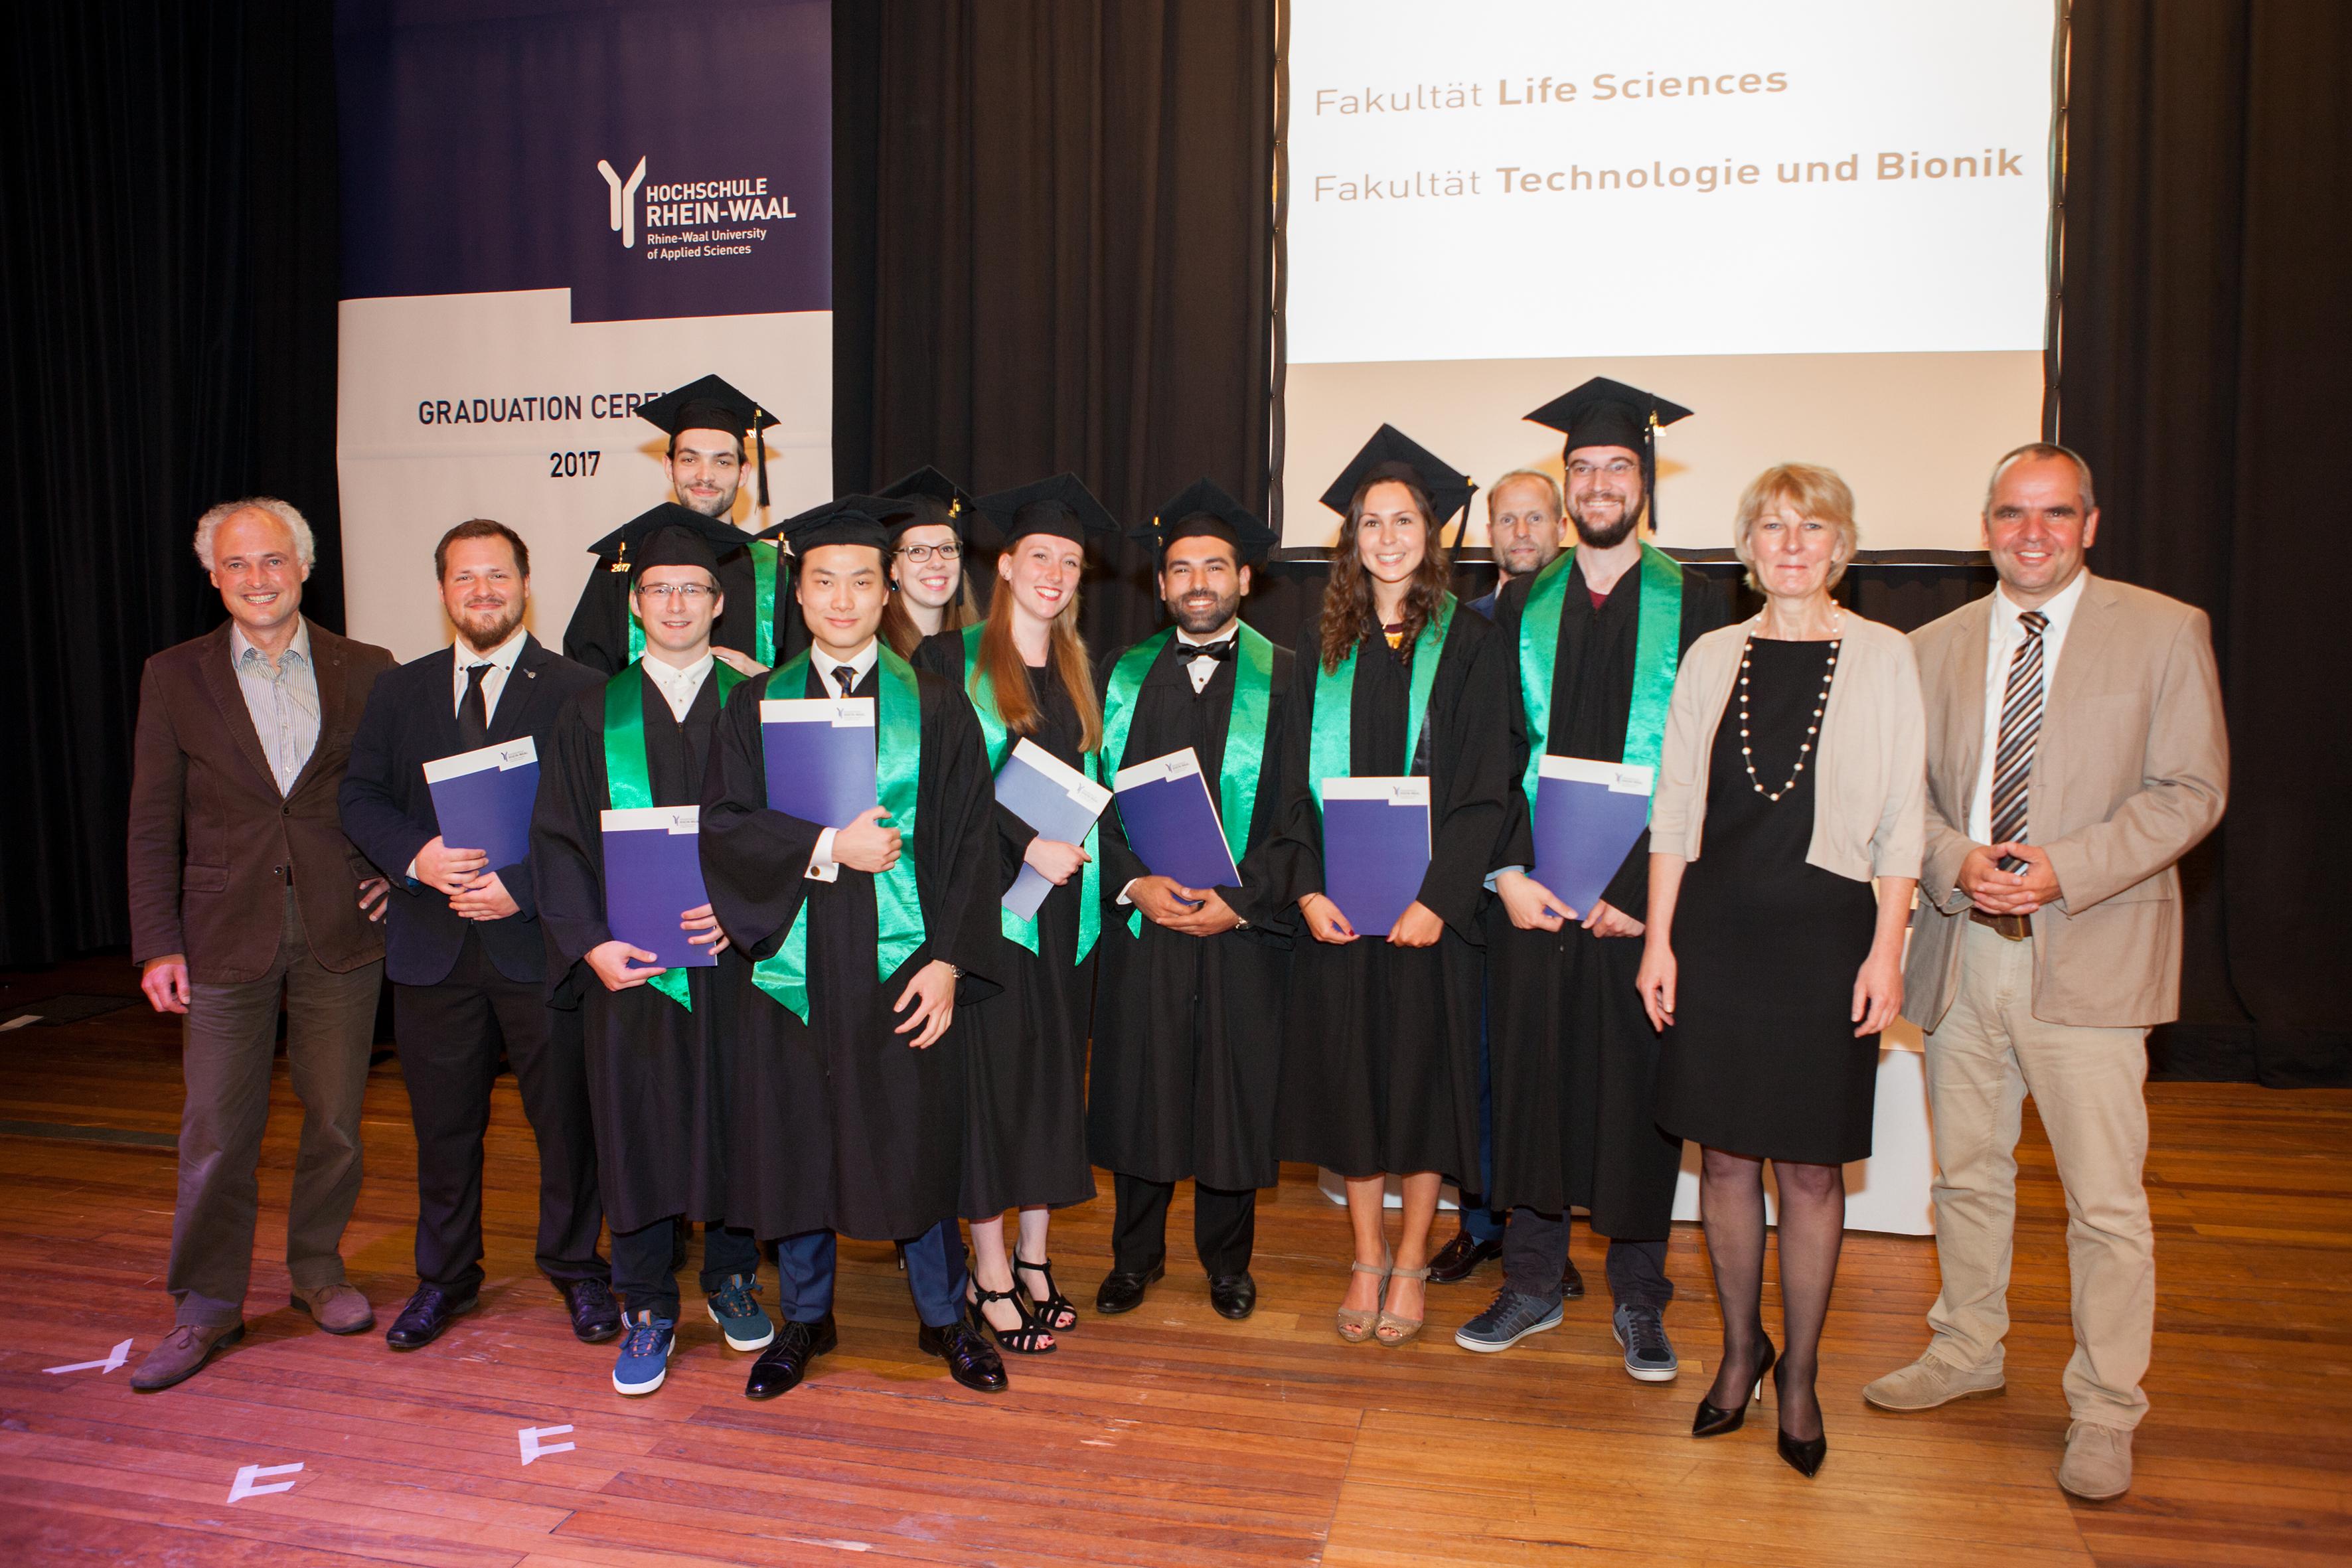 Graduation Ceremony Reception: Graduation Ceremony 2017 At Rhine-Waal University Of